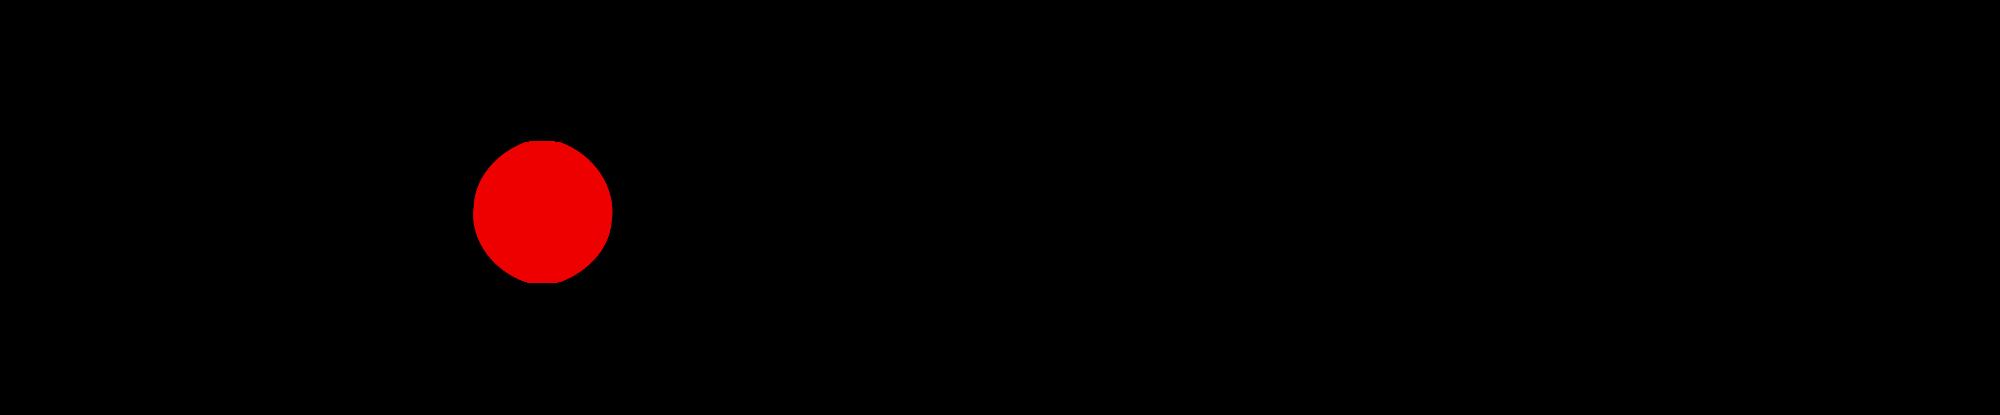 Ndtv logo clipart black and white stock Ndtv logo png » PNG Image black and white stock